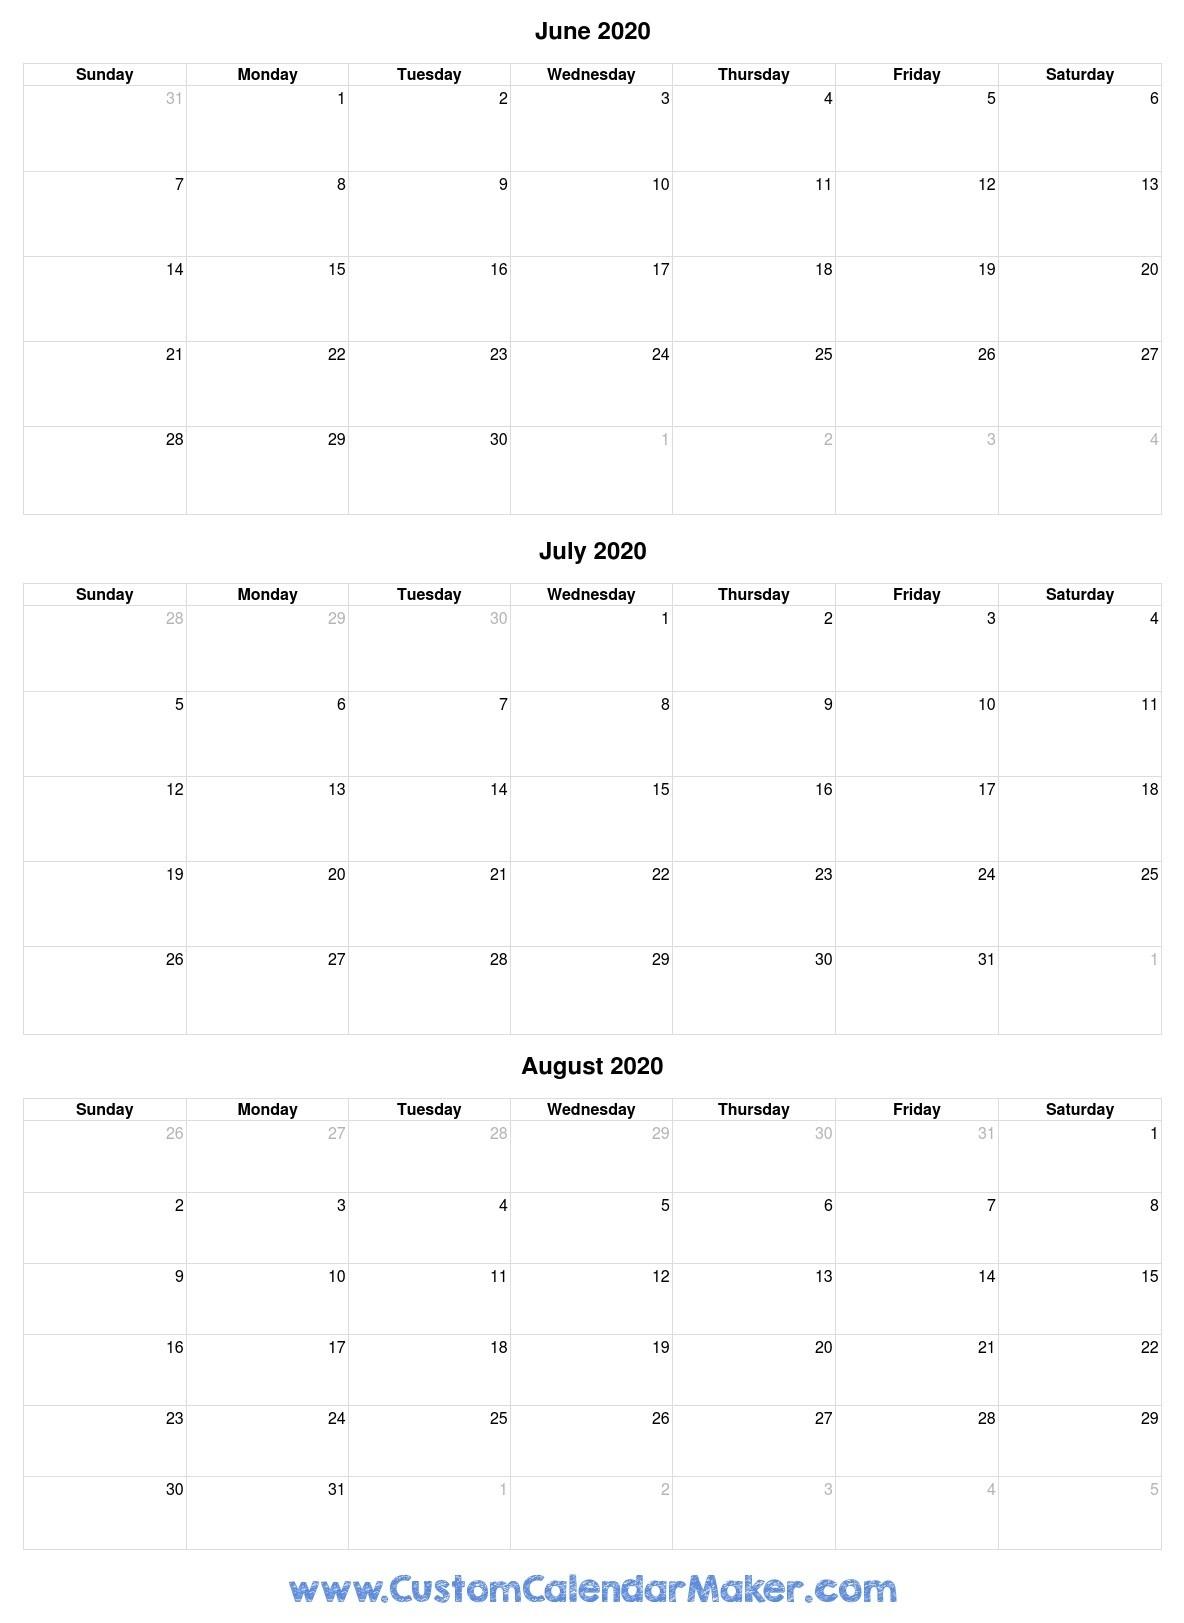 June To August 2020 Calendar-June-August 2020 Blank Clanedars